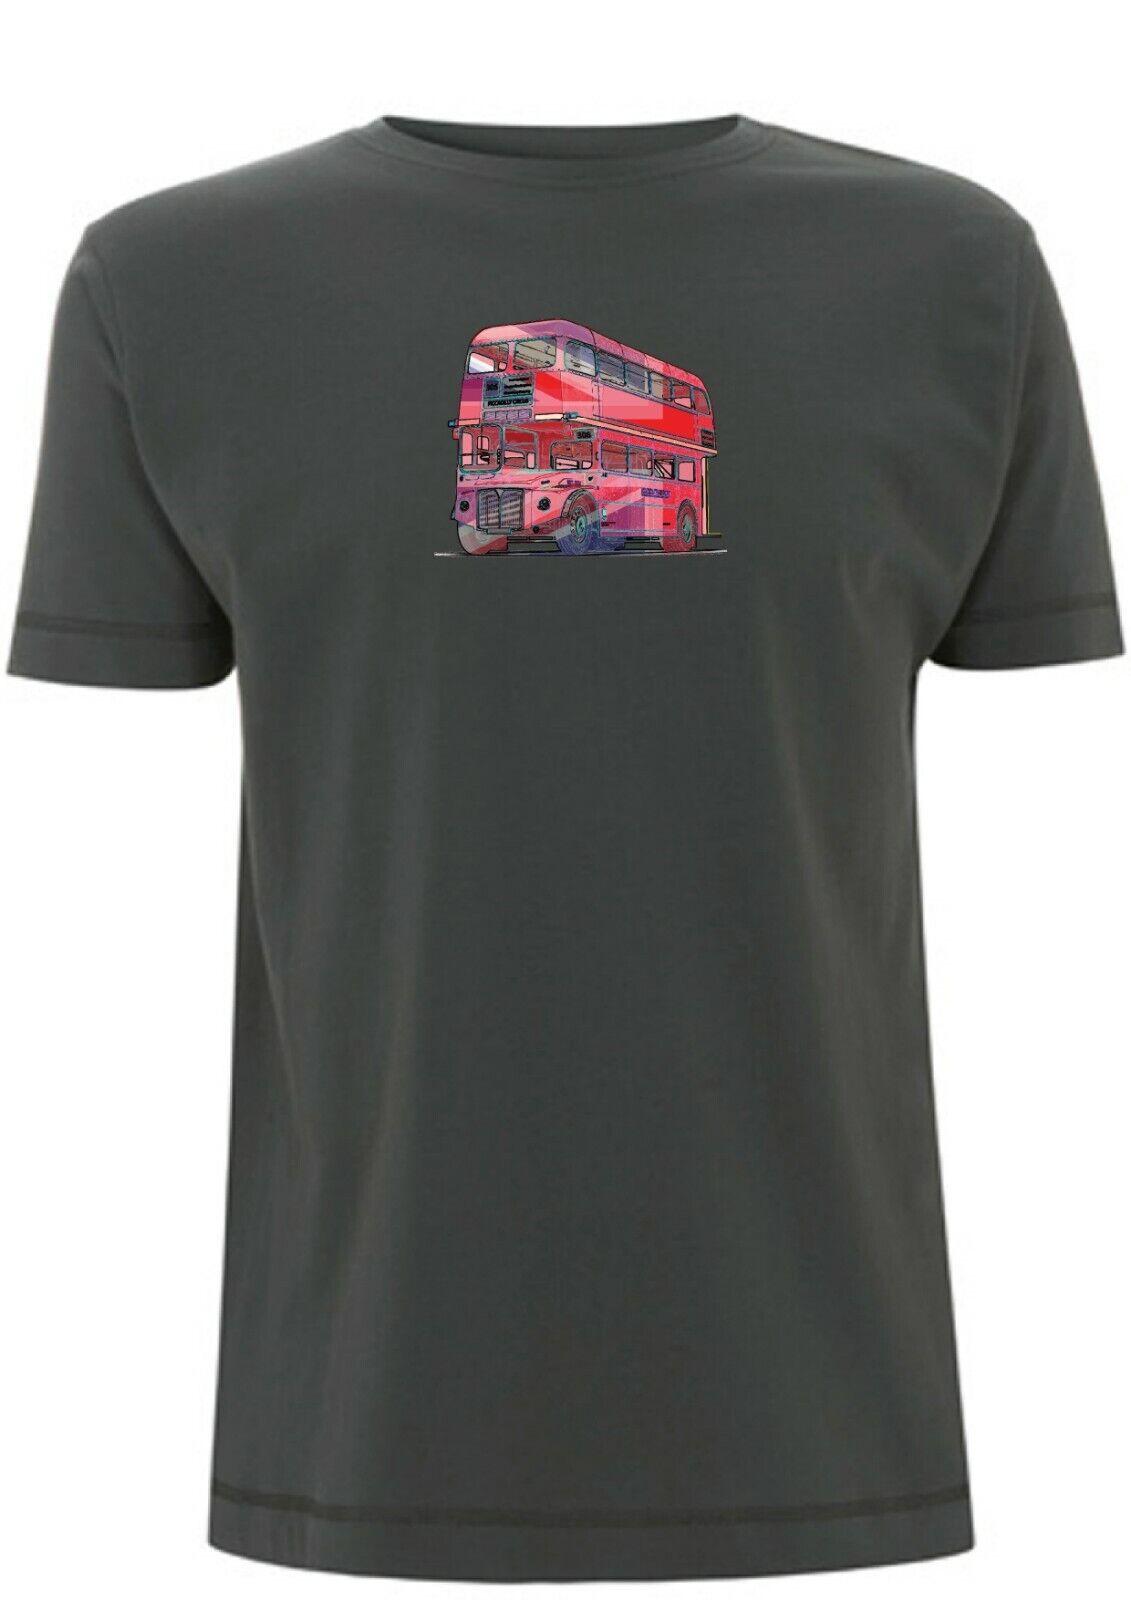 bus t shirt